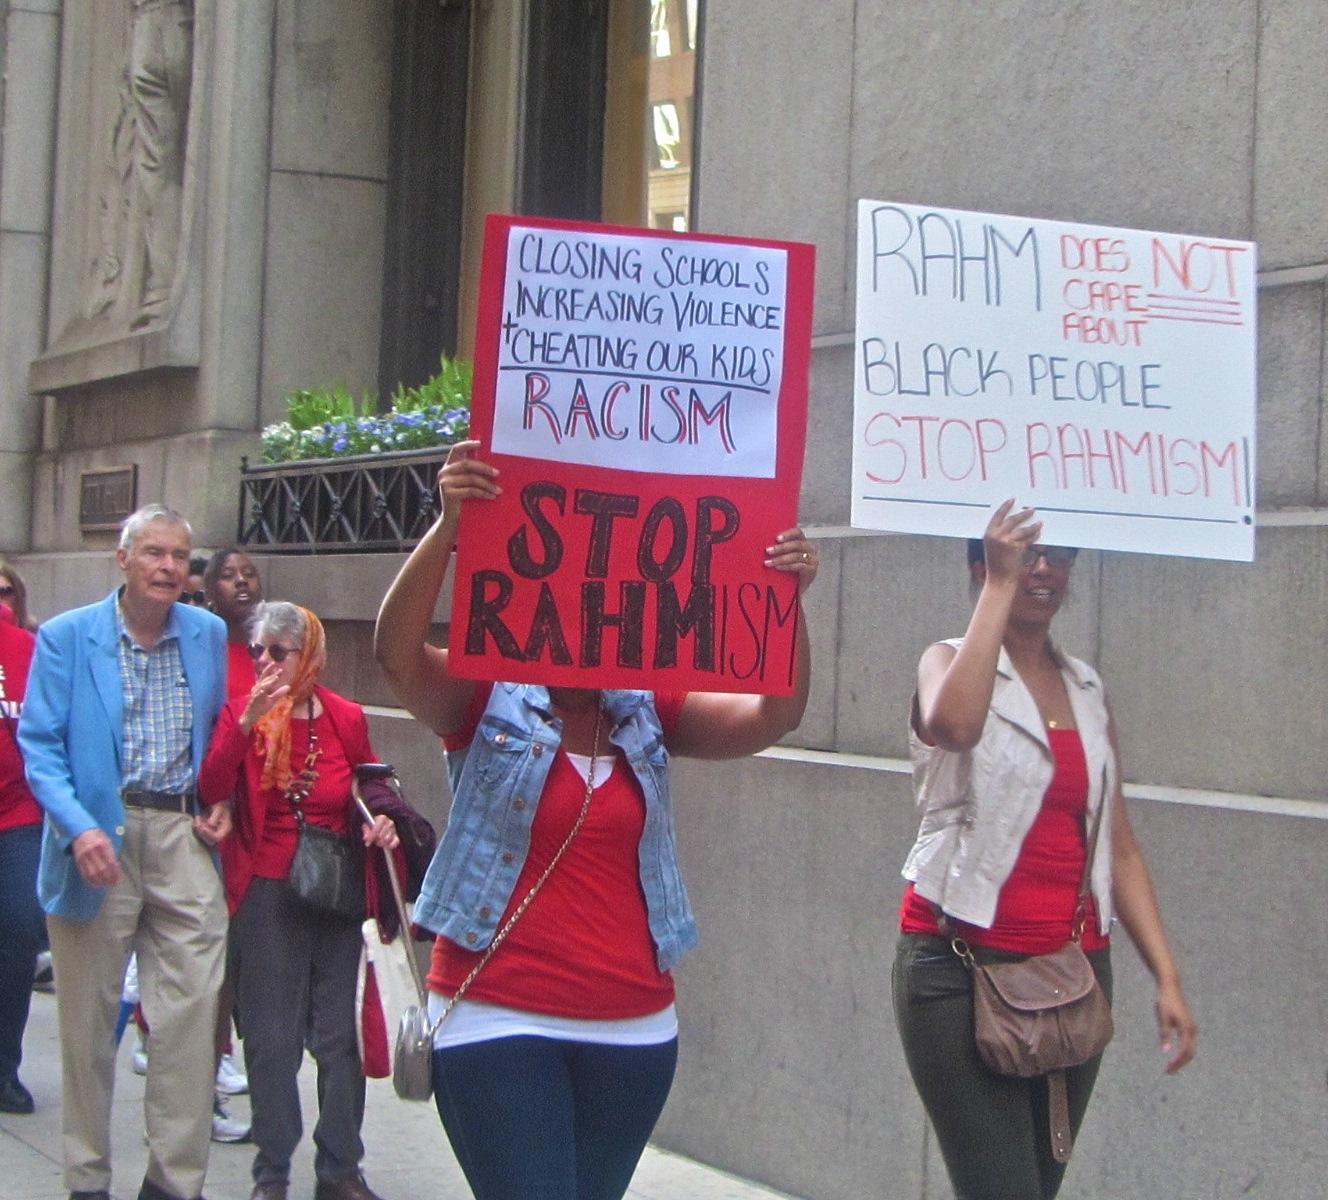 Chicago closes more schools in Black neighborhood